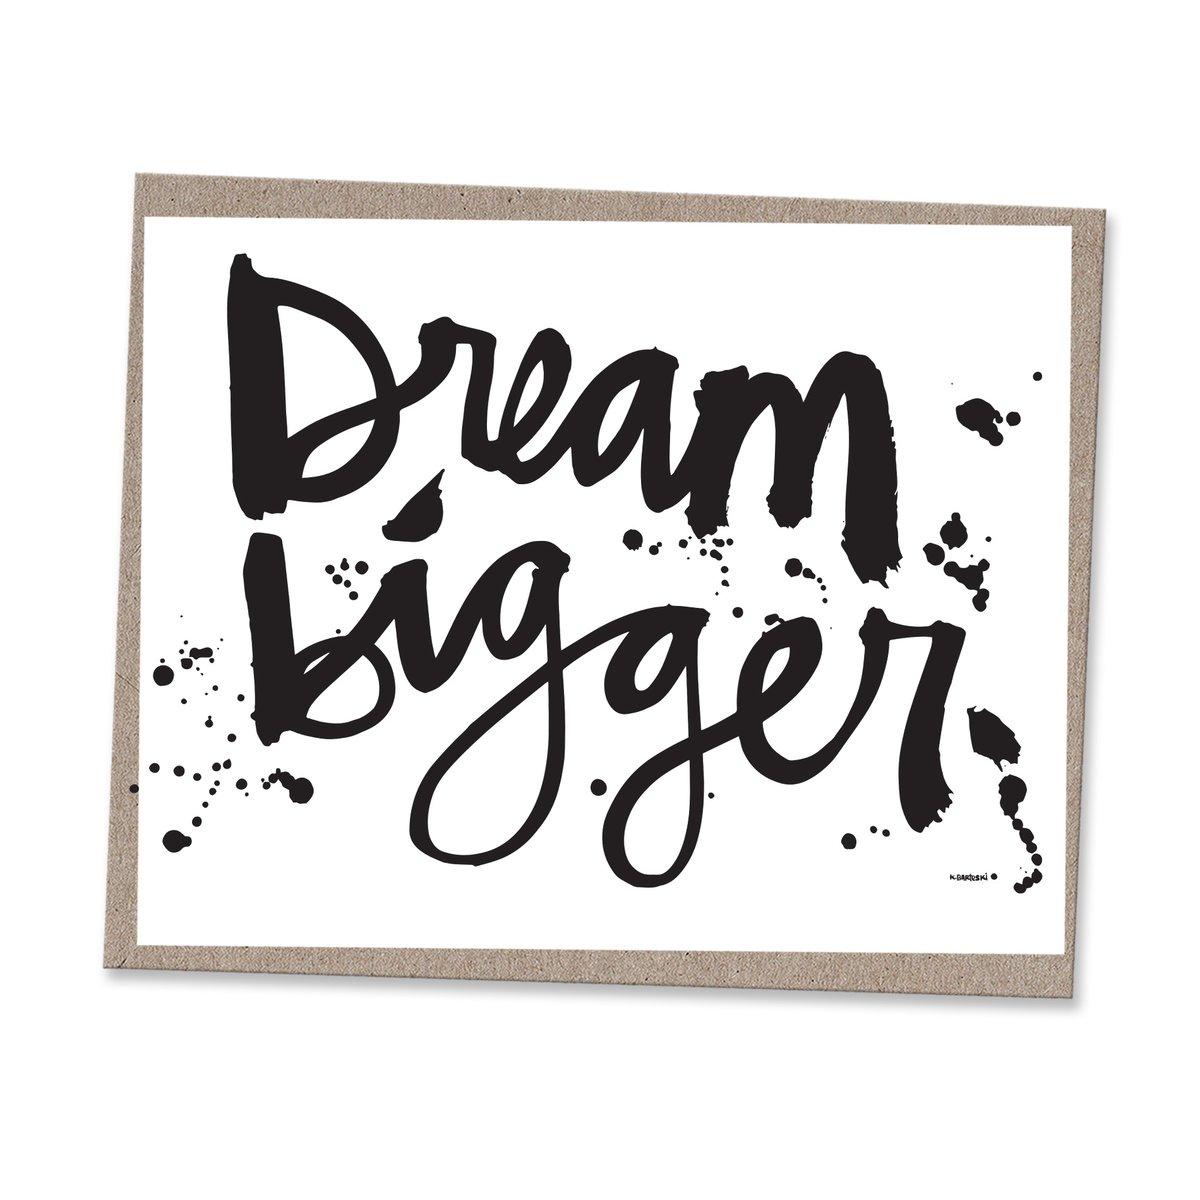 Image of DREAM BIGGER #kbscript print